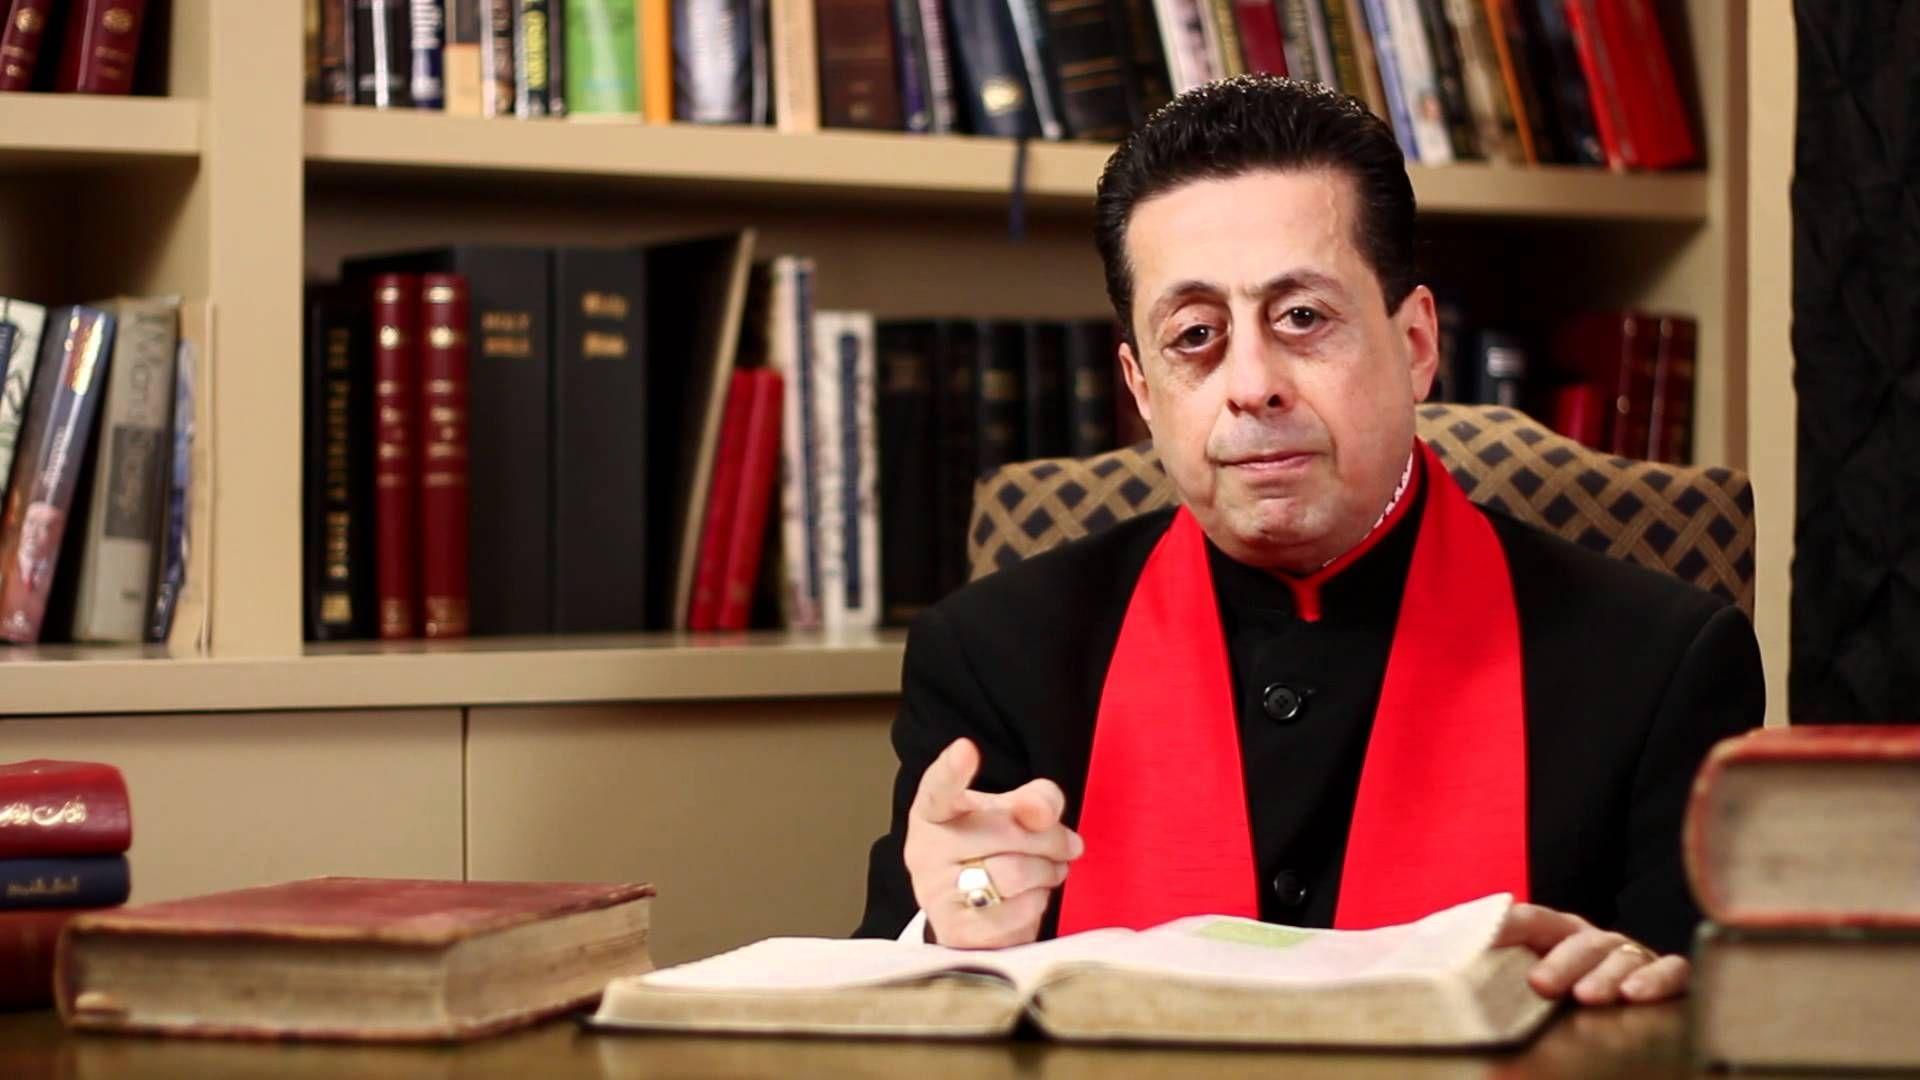 Apostle doctor christian harfouche prophetic teaching